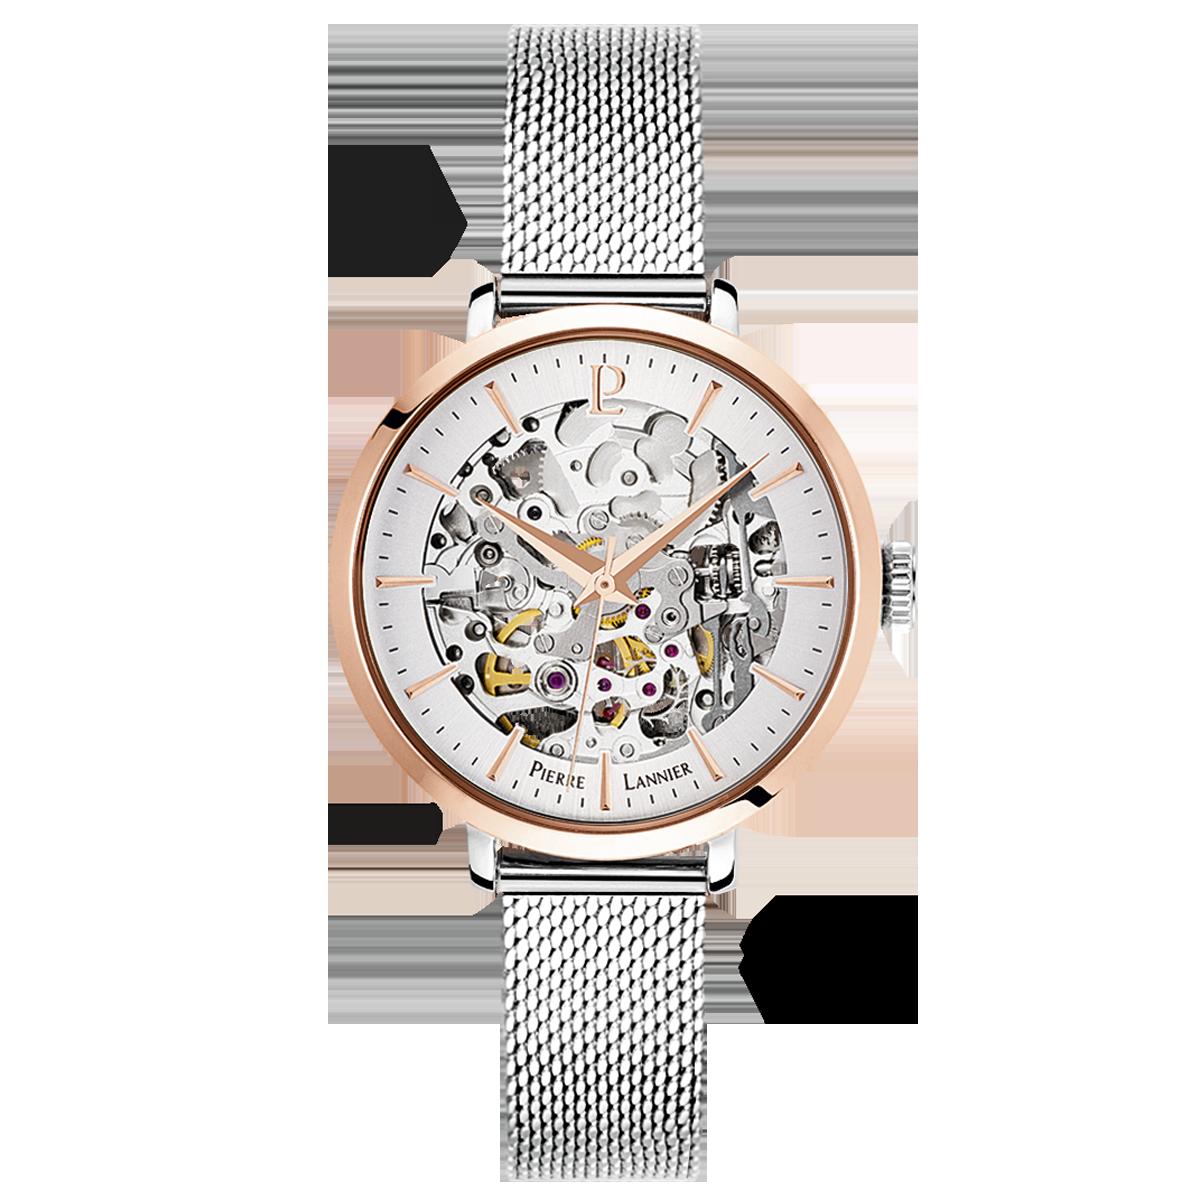 Женские часы Pierre Lannier Automatic Box 350G628